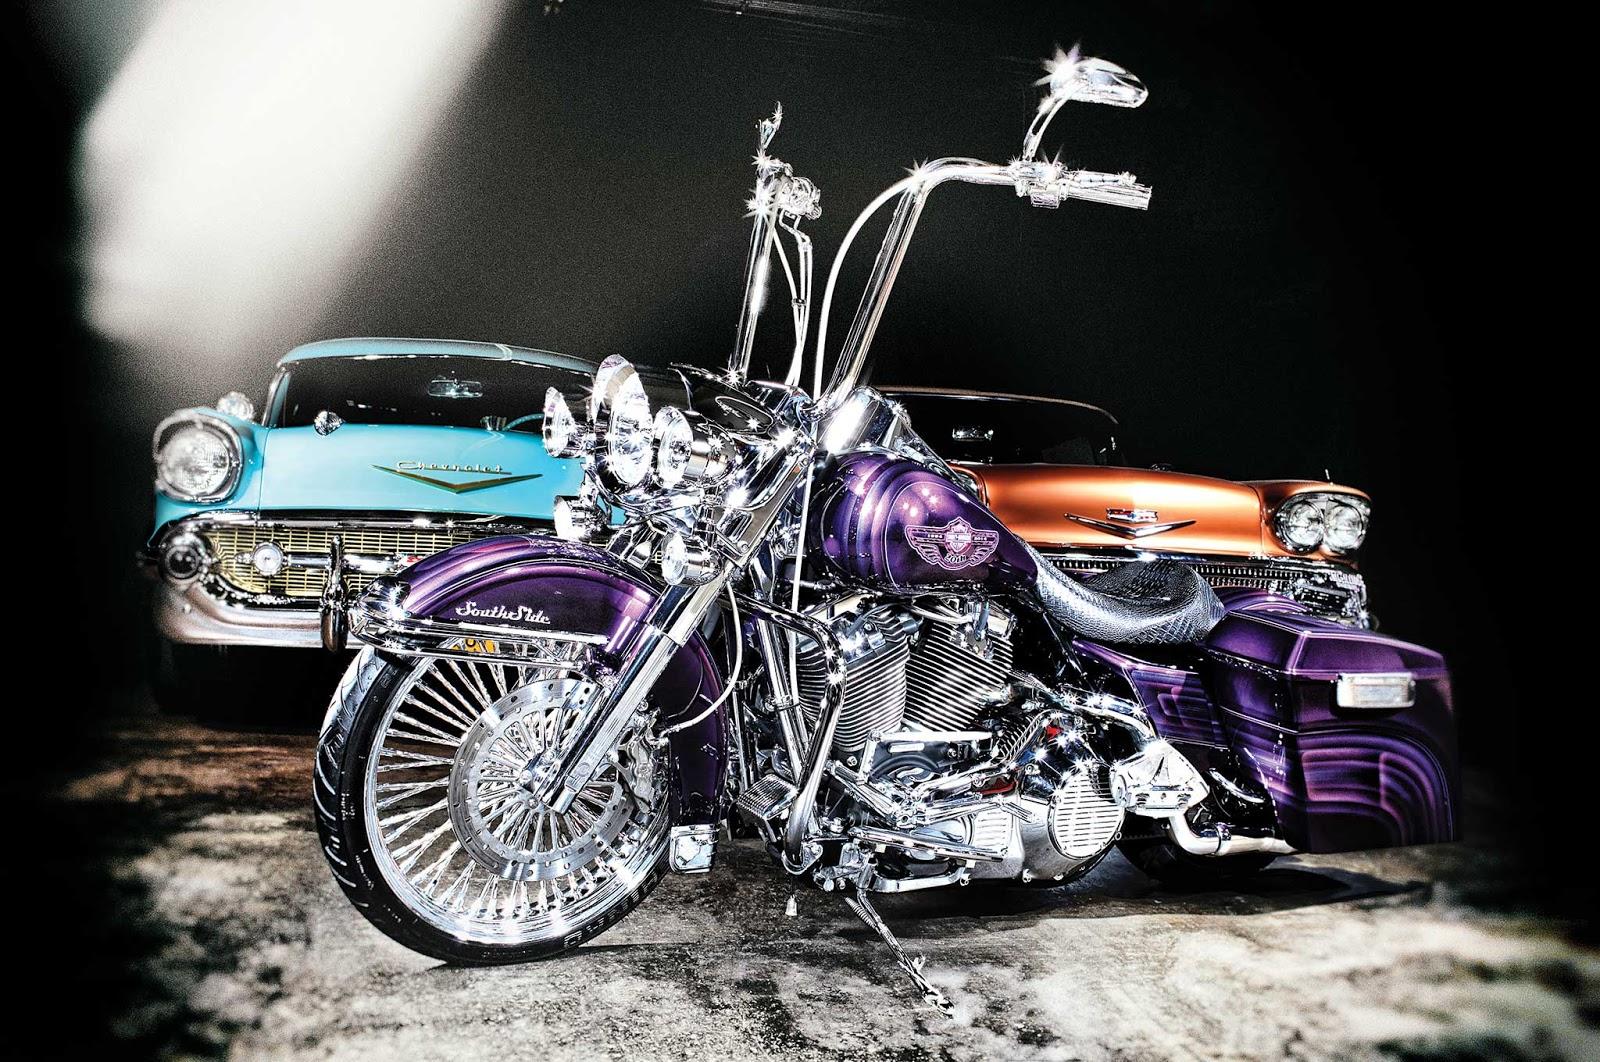 lowrider, custom car, hot rod, bikers and cars & girls ...